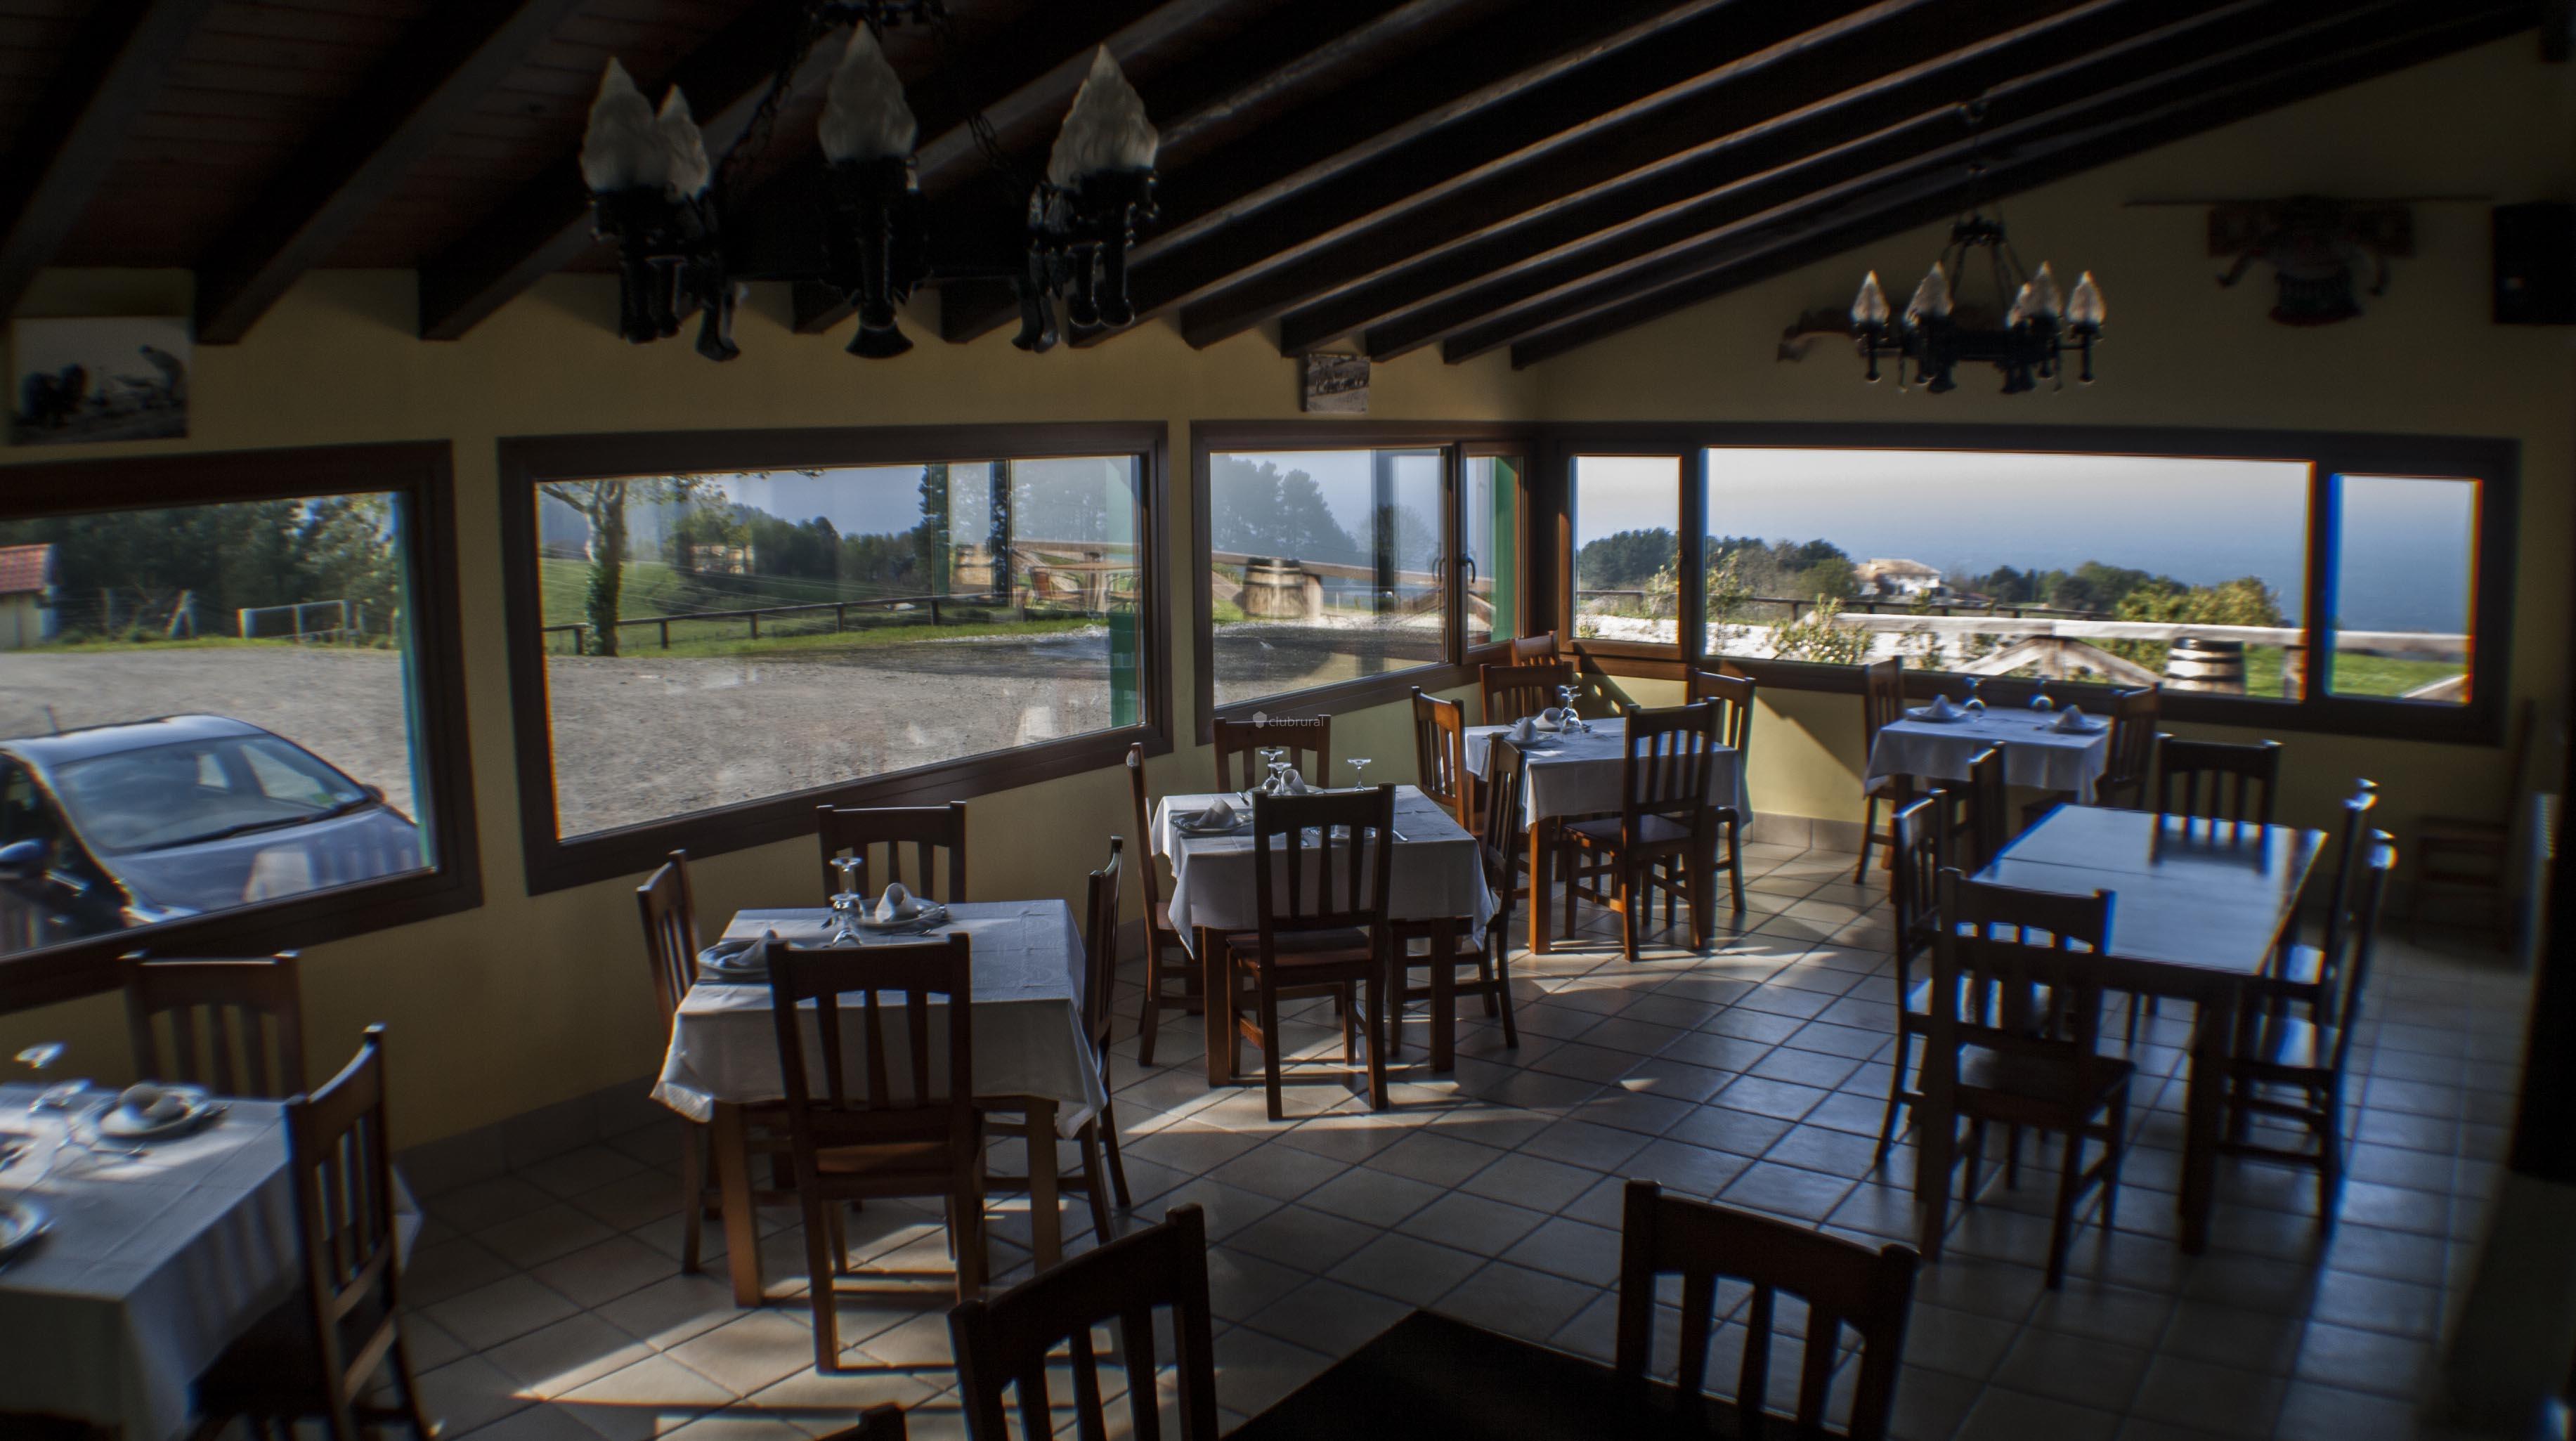 Fotos de pikua guipuzcoa mutriku clubrural - Casas rurales pais vasco alquiler integro ...